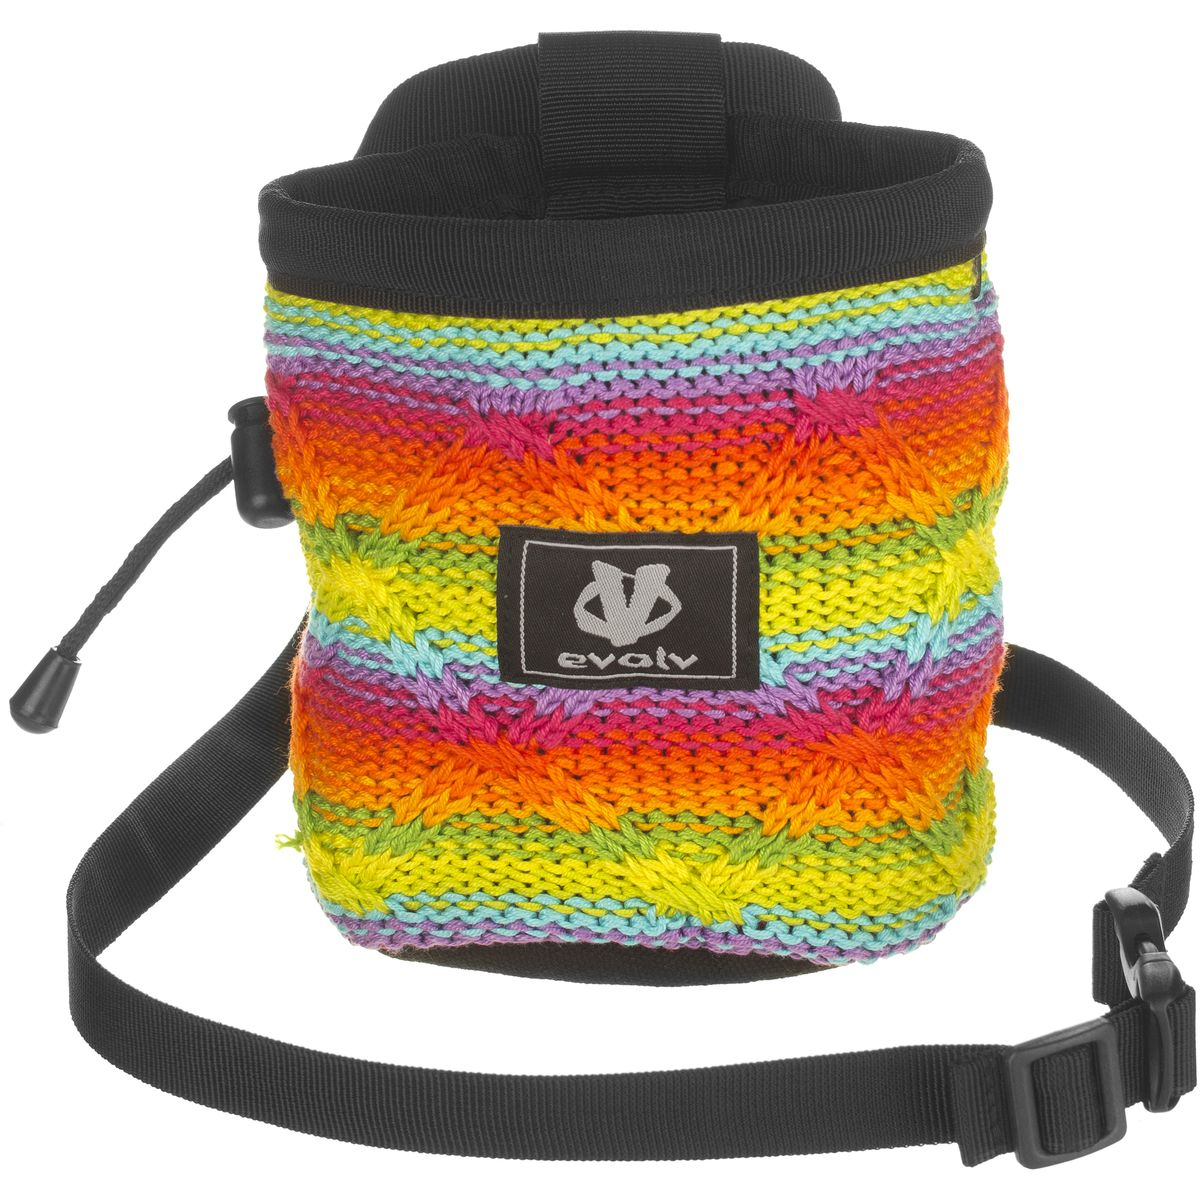 evolv Cotton Knit Chalk Bag